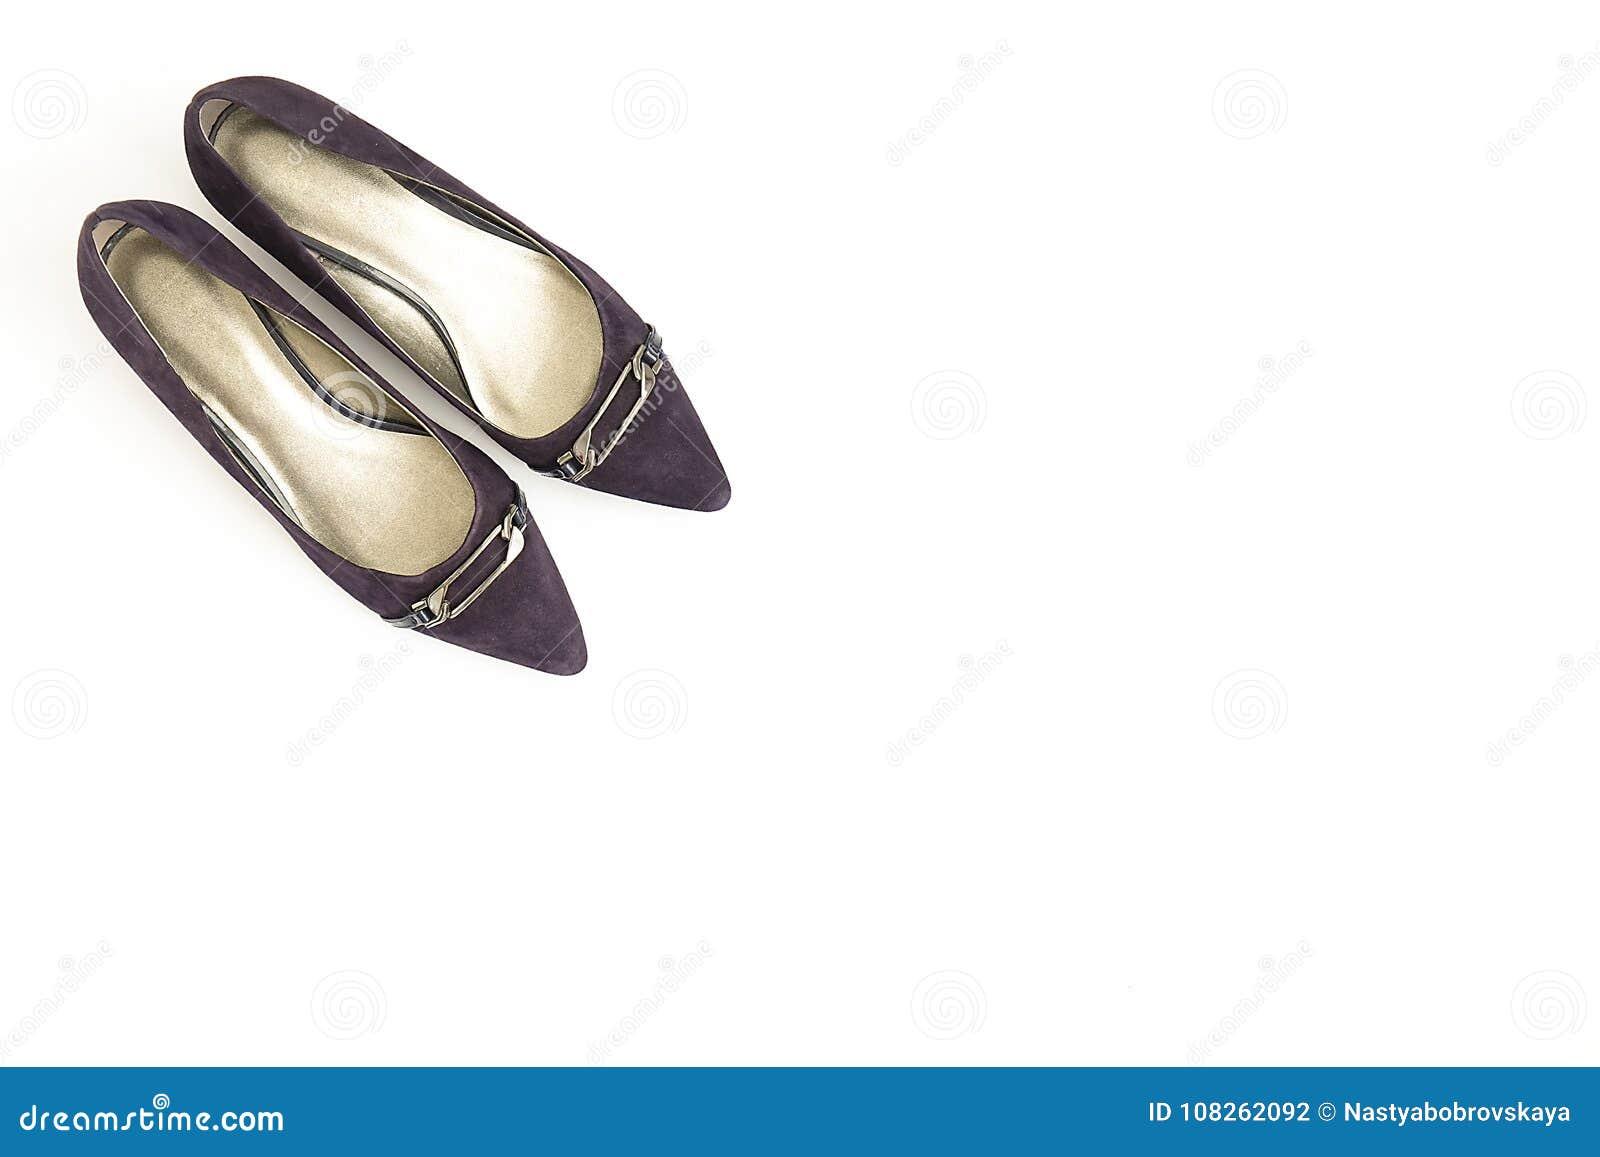 1a272420b Fashionable medium heeled women`s leather wedge shoes isolated on white.